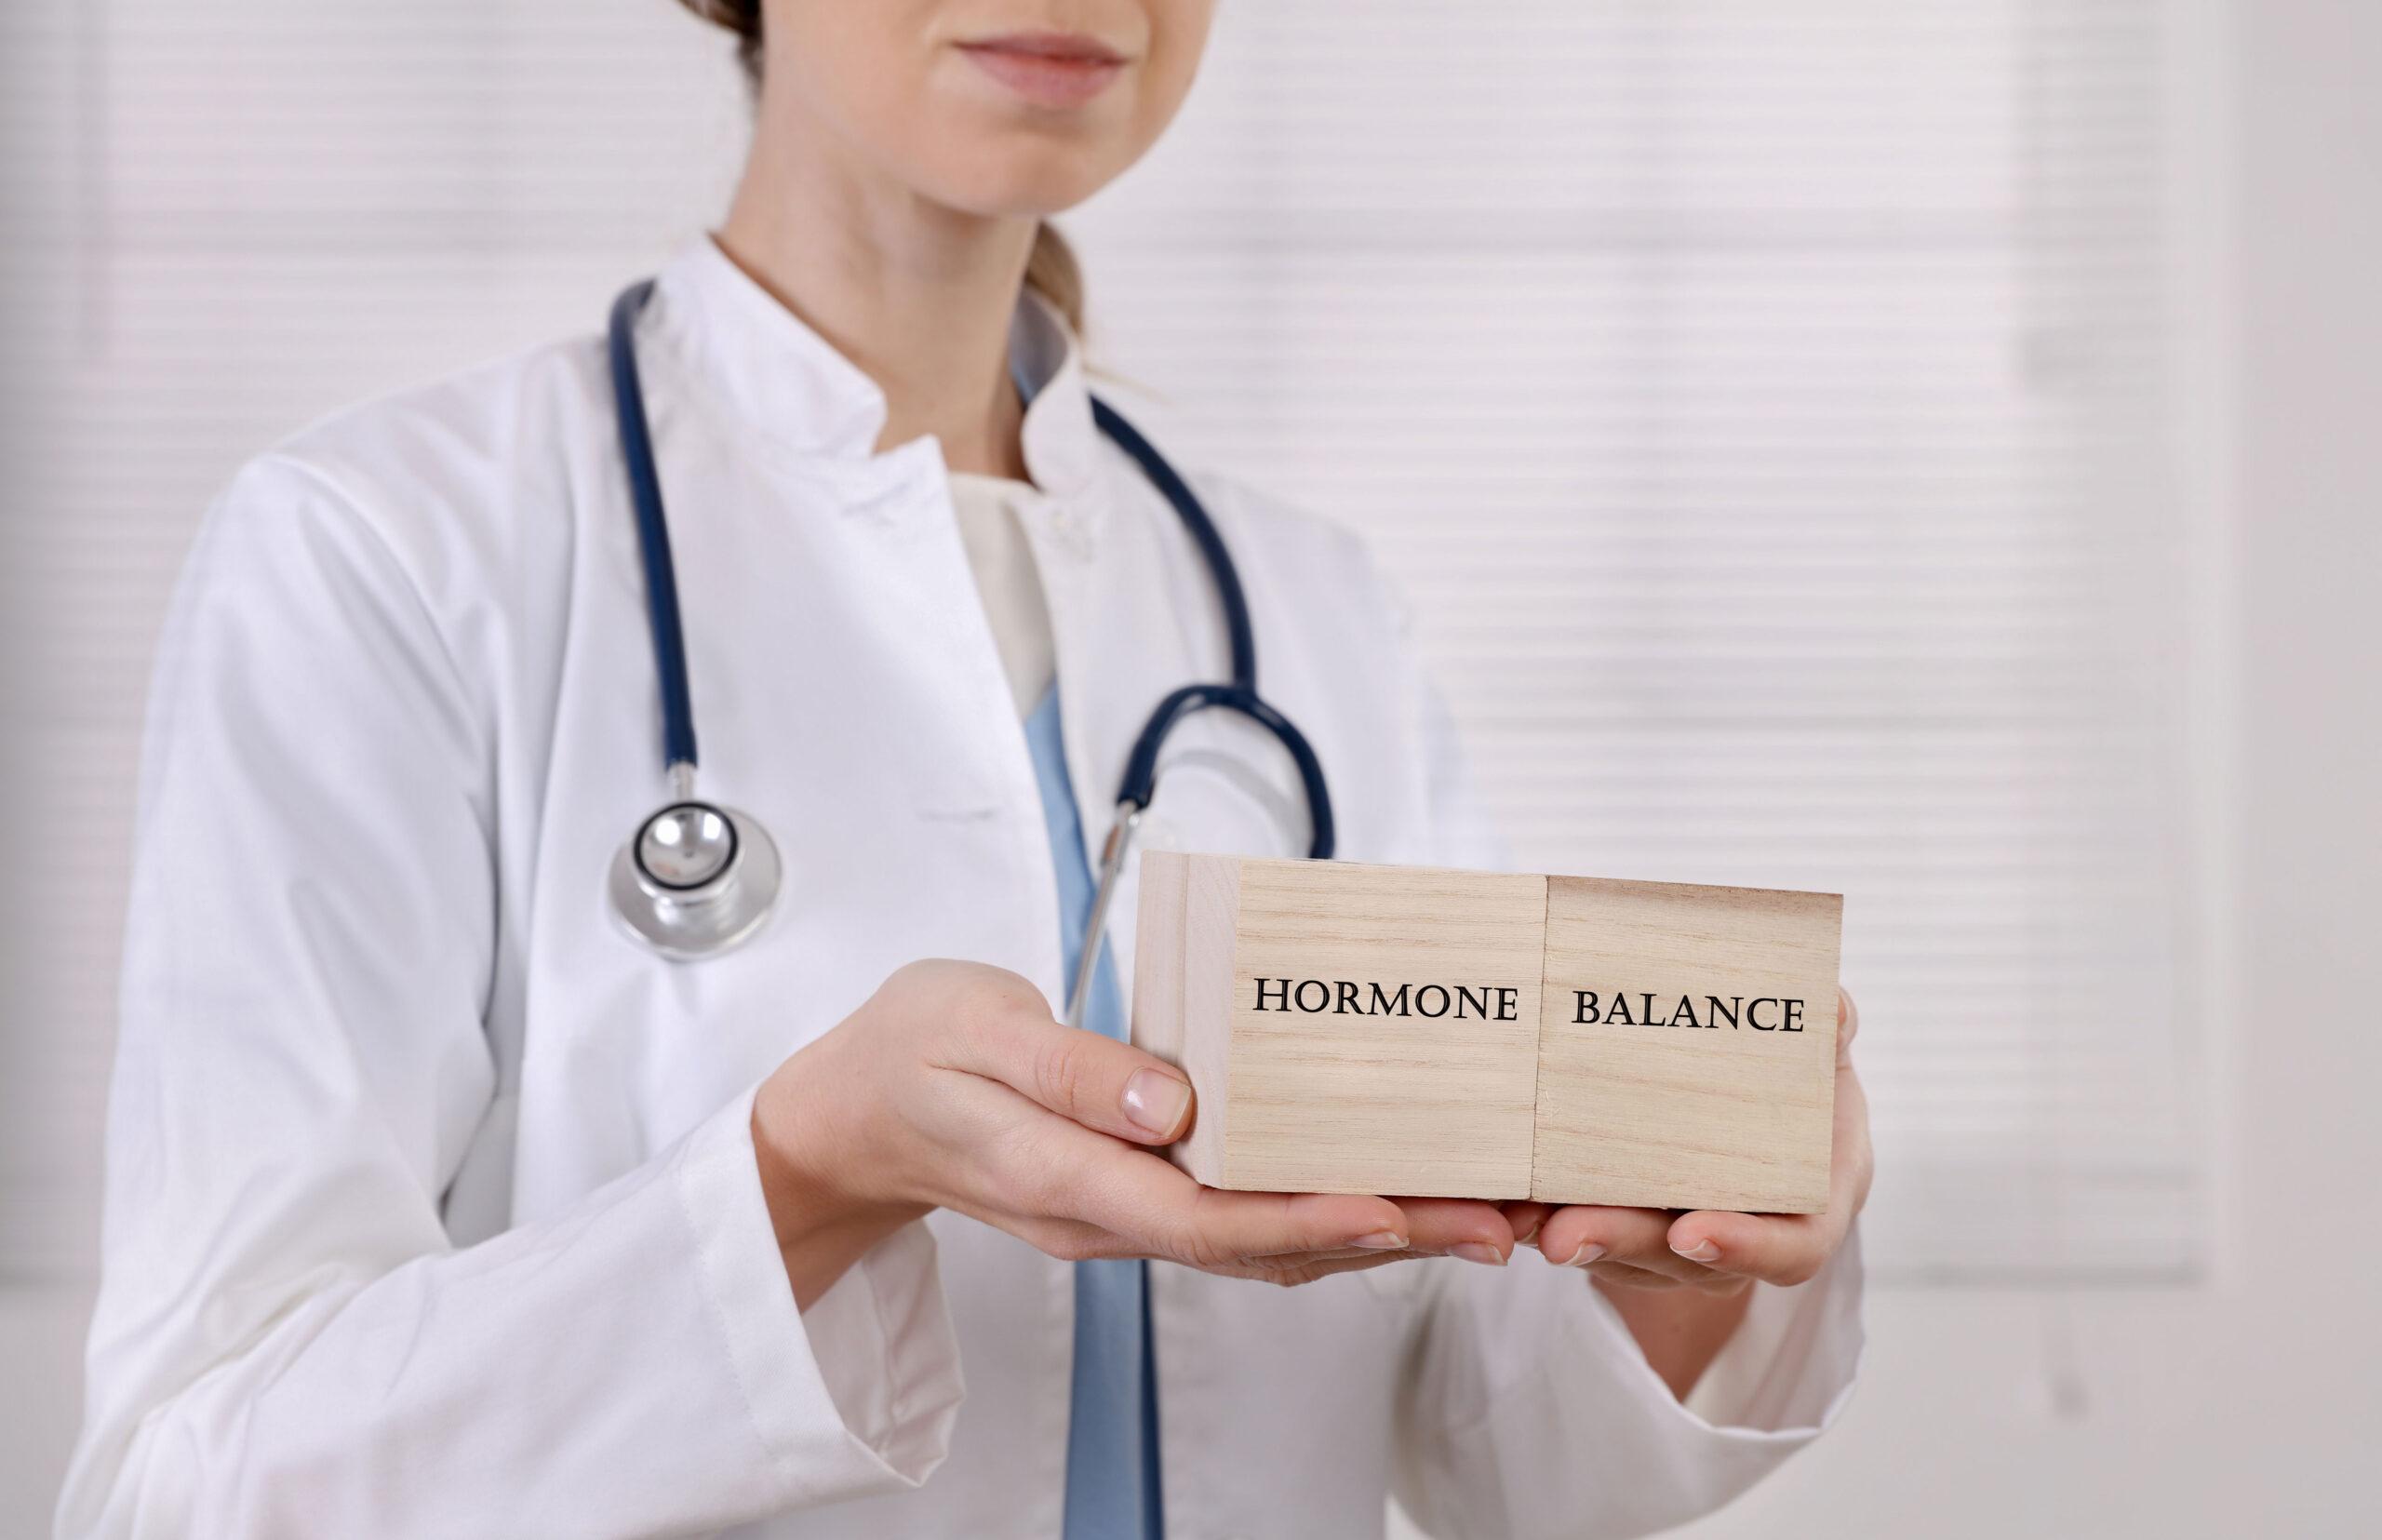 mikrolab diagnostiko service hormones